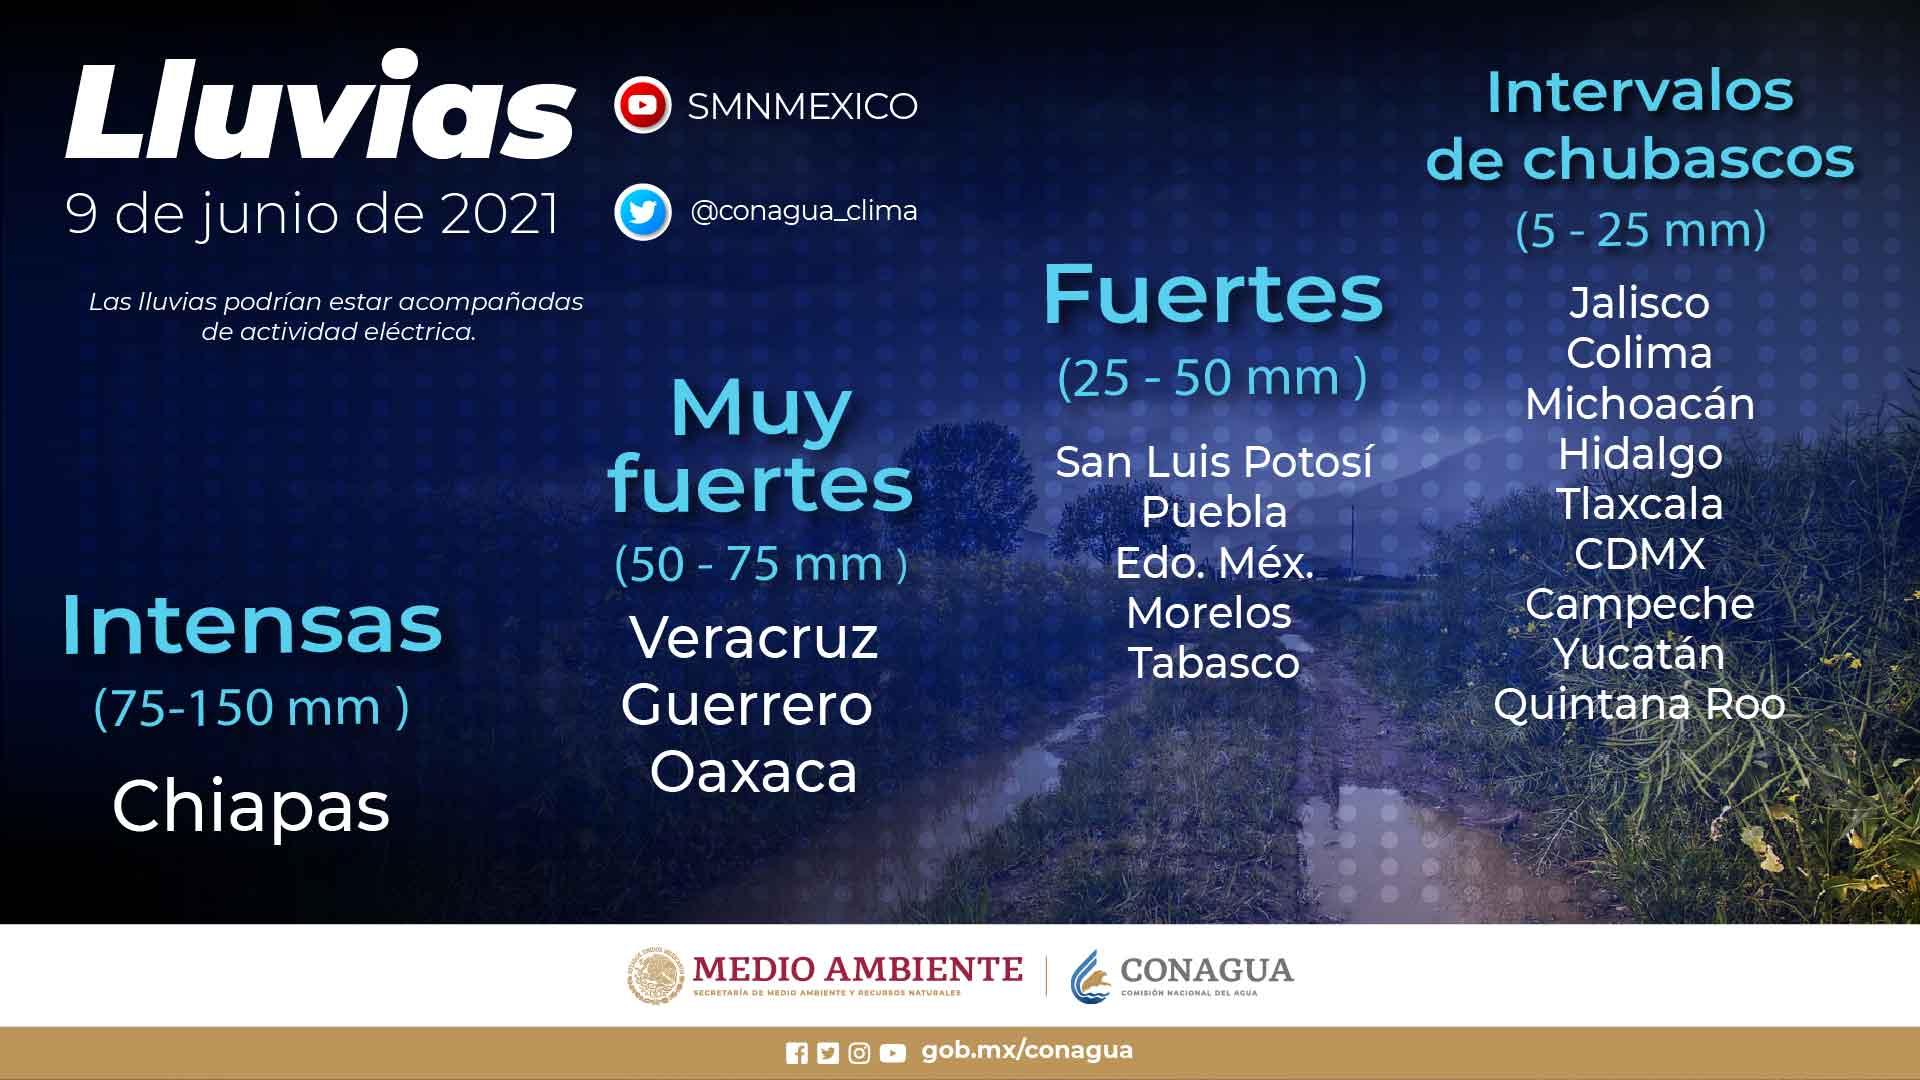 Continuarán las lluvias para Tlaxcala el dia de hoy miércoles